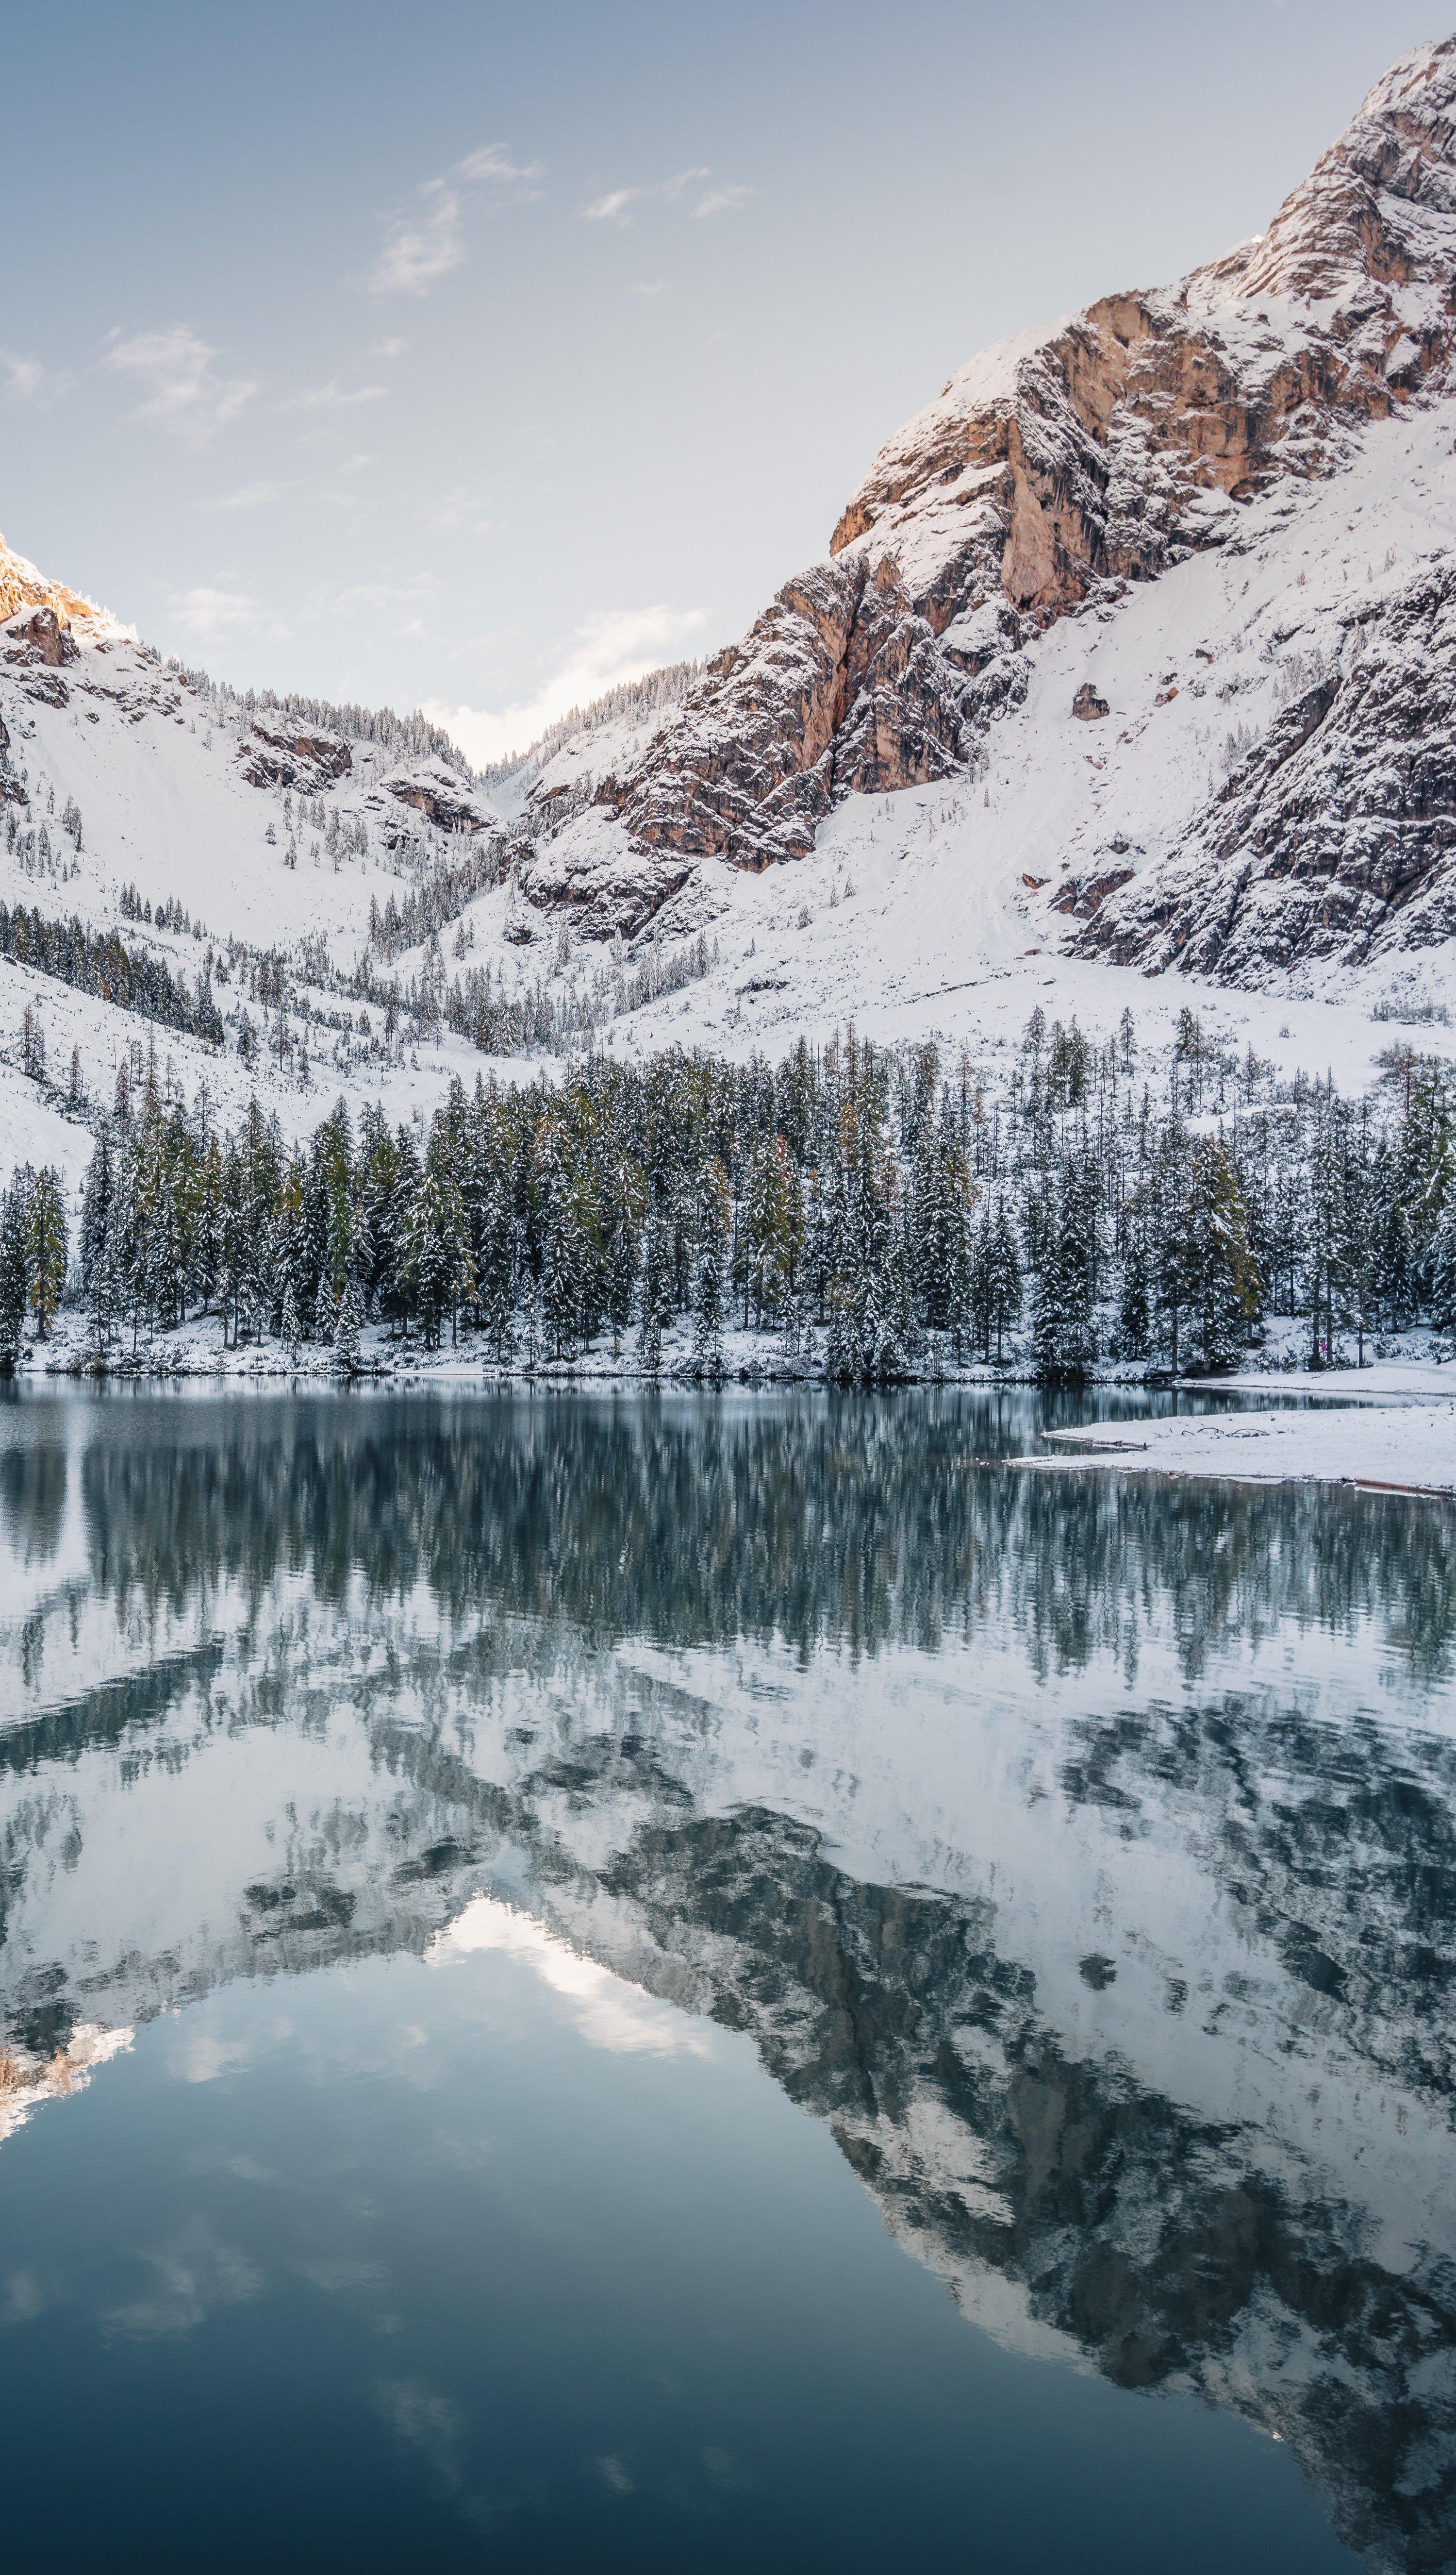 Fondos de pantalla Montañas cubiertas de nieve Vertical